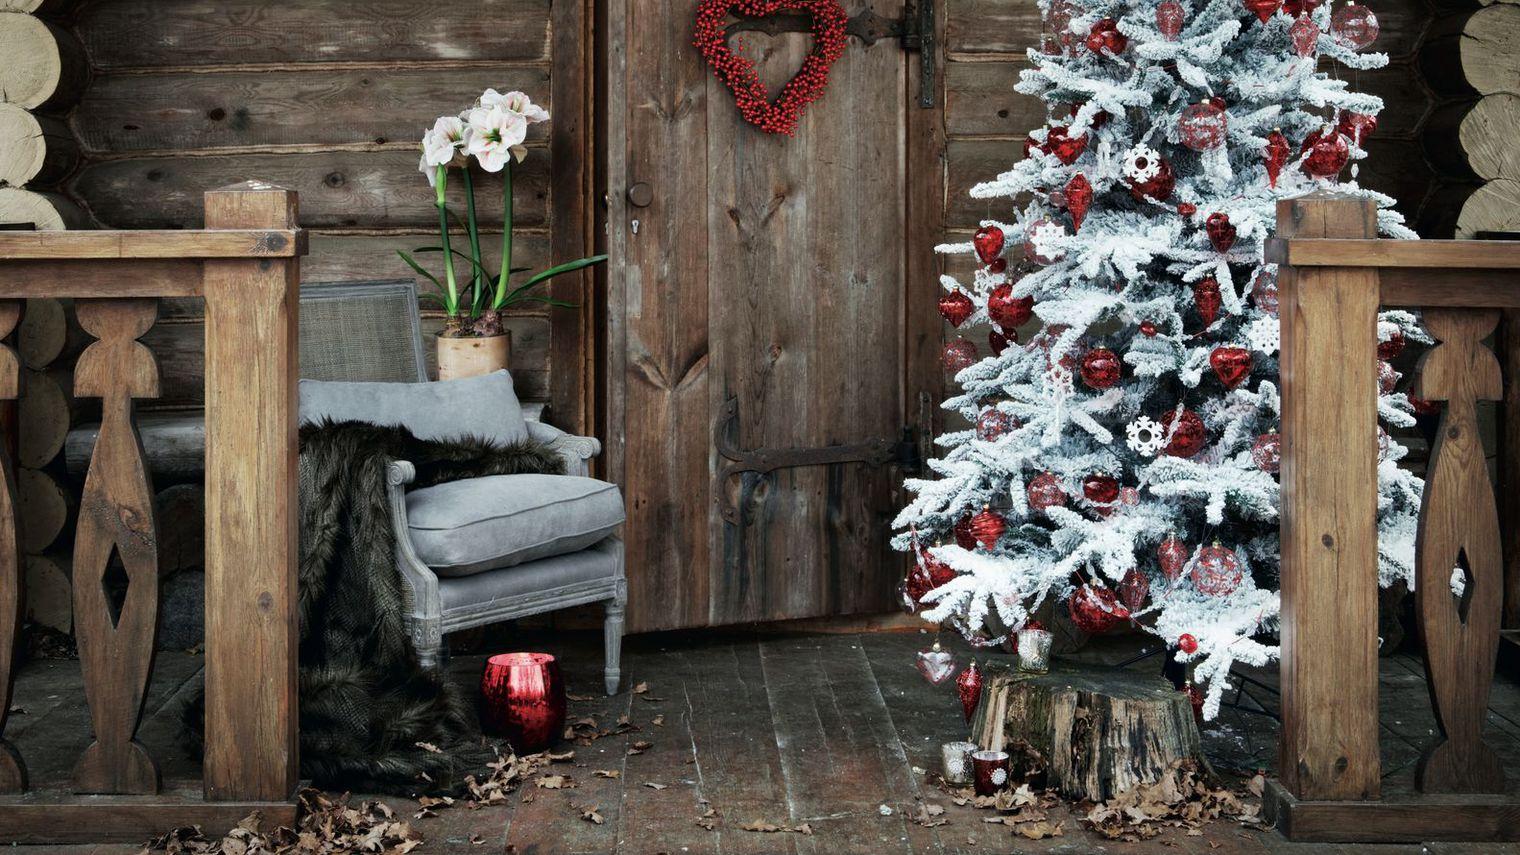 d coration terrasse pour noel exemples d 39 am nagements. Black Bedroom Furniture Sets. Home Design Ideas